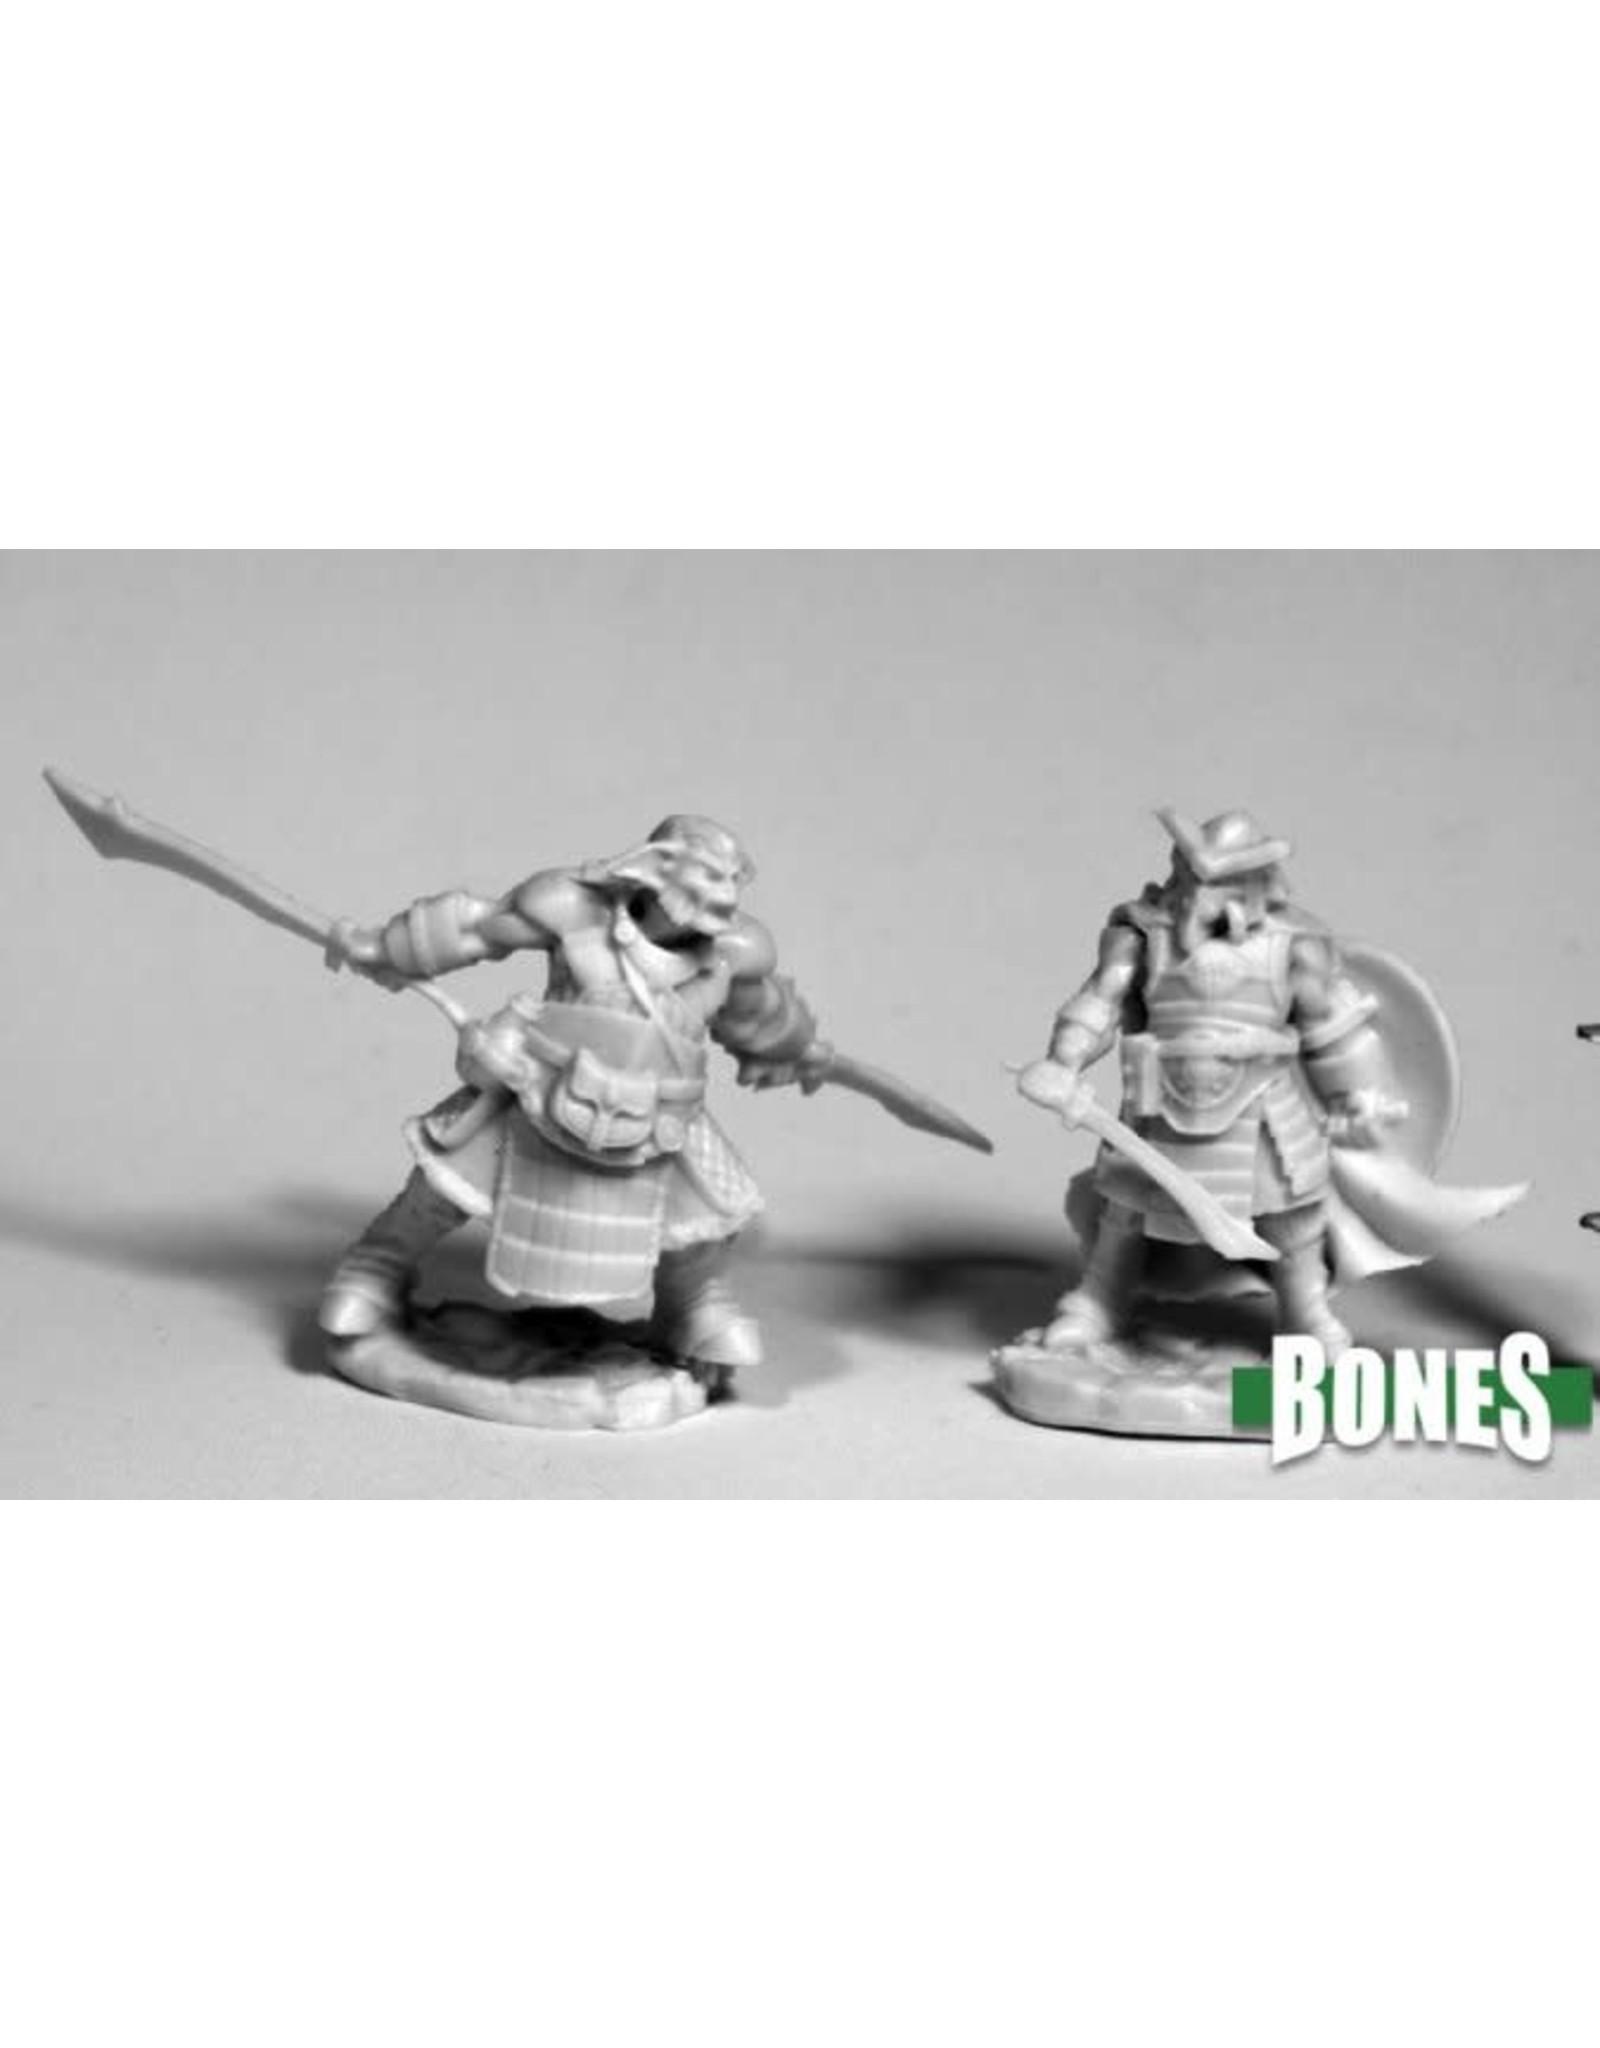 Bones: Hobgoblin Veterans